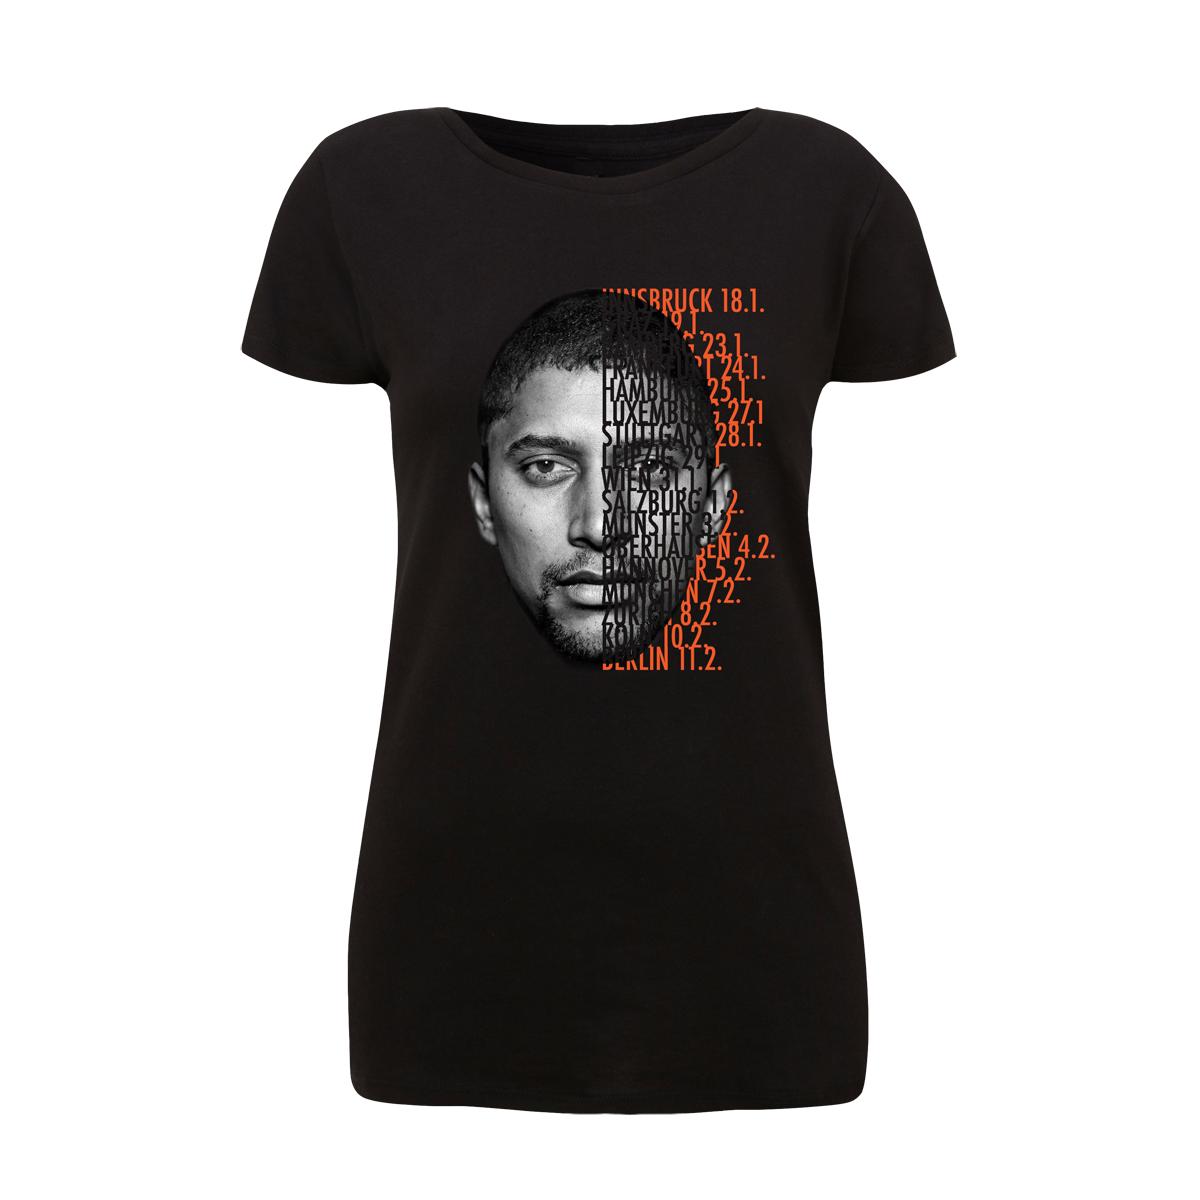 Andreas Bourani Tour 2016 Shirt Damen Girlie, schwarz